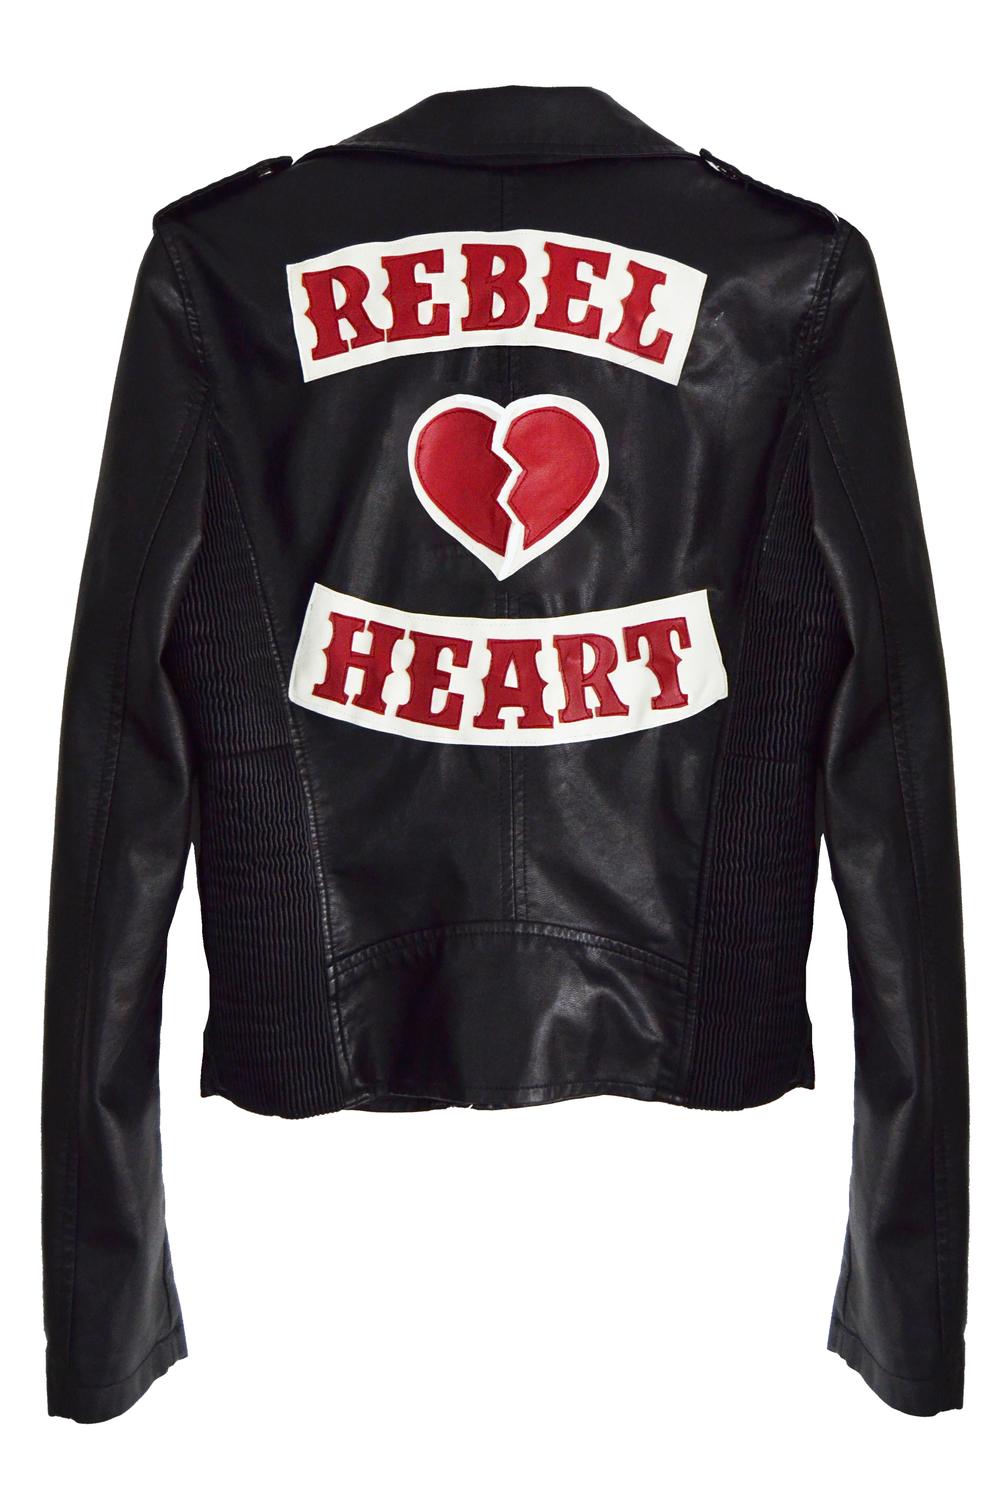 high heels suicide_rebel heart_leather jacket.jpg